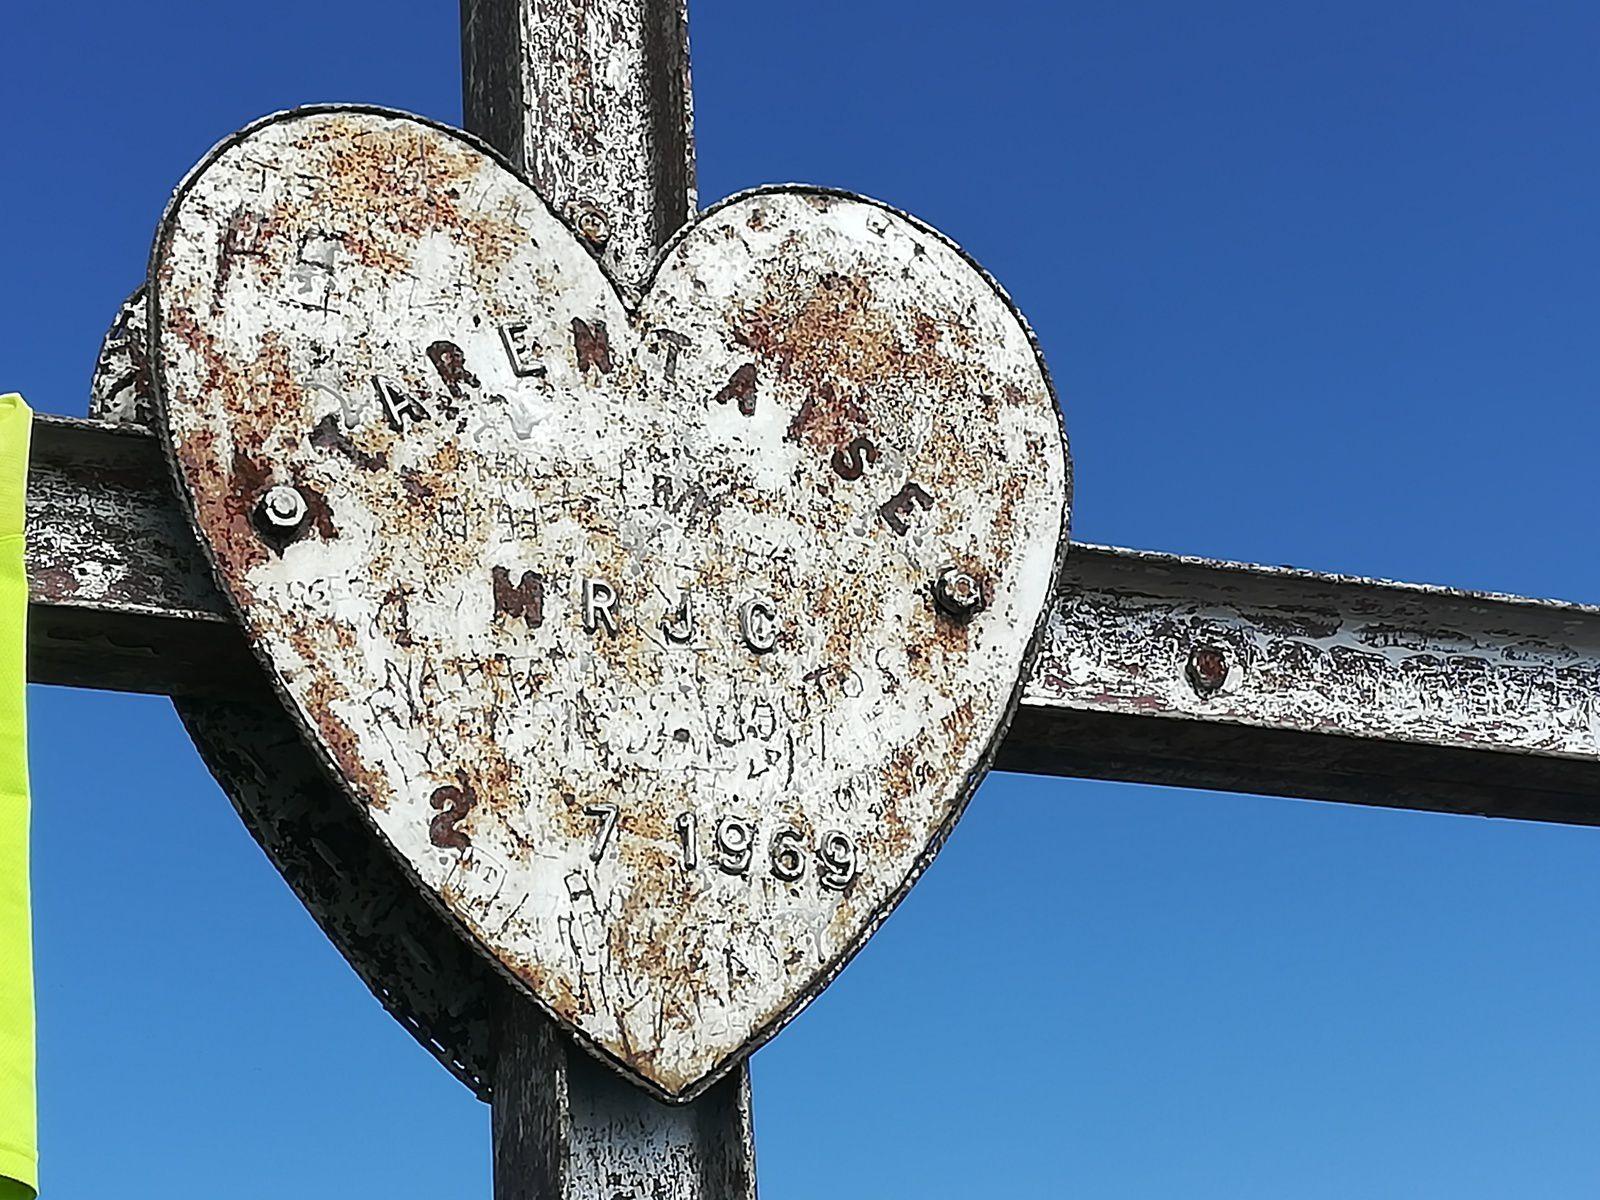 le cœur Tarin